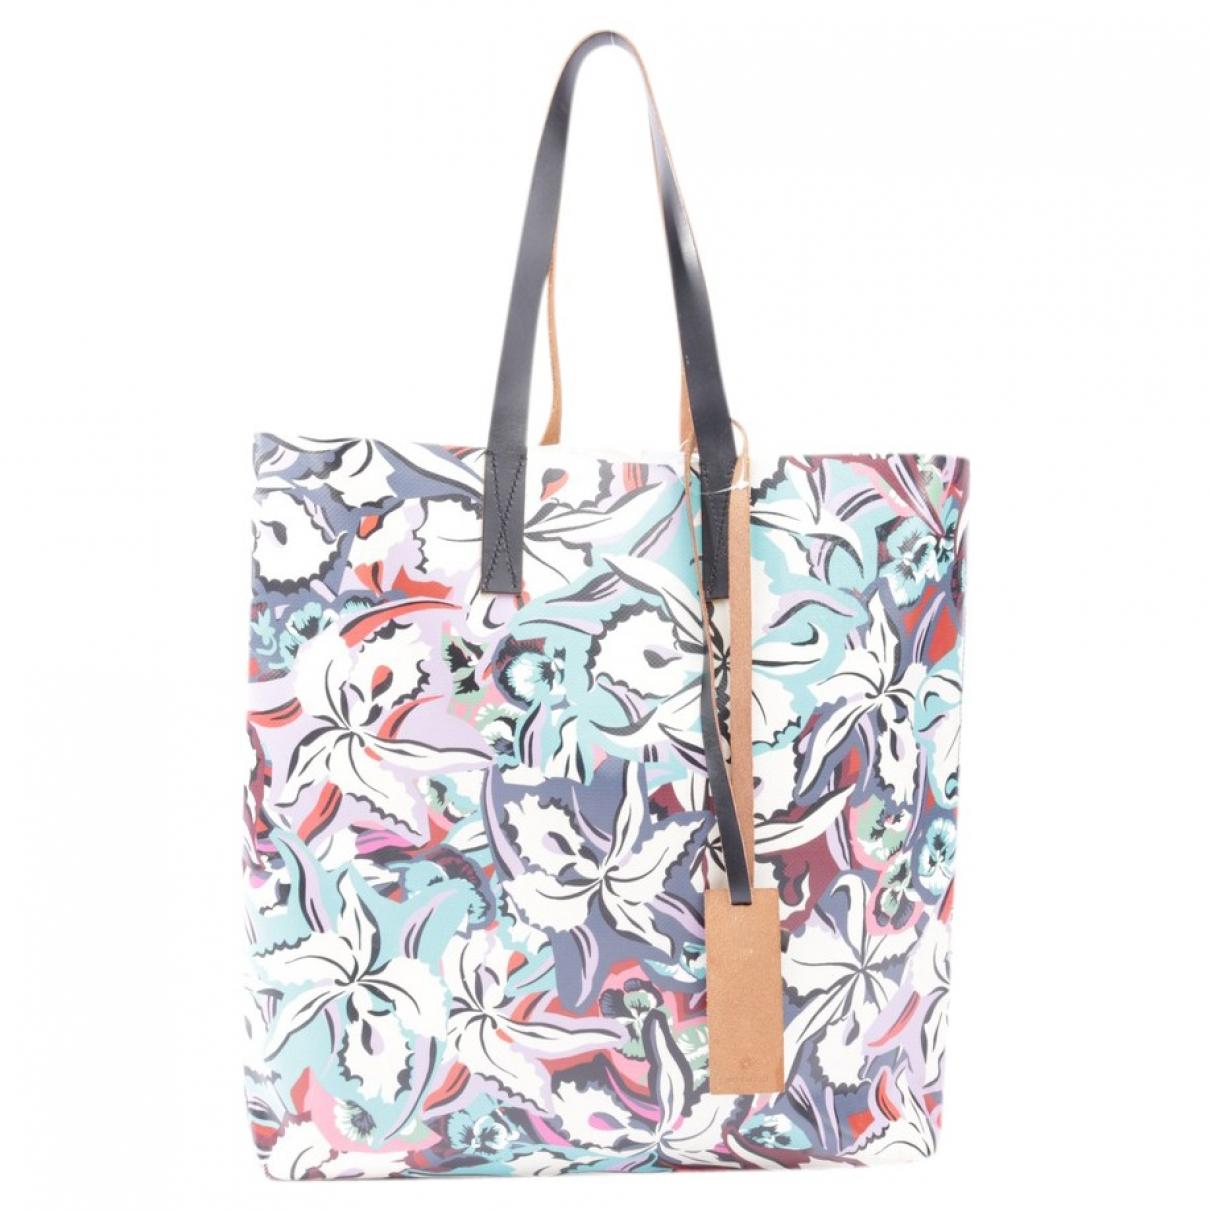 Marni \N Multicolour handbag for Women \N